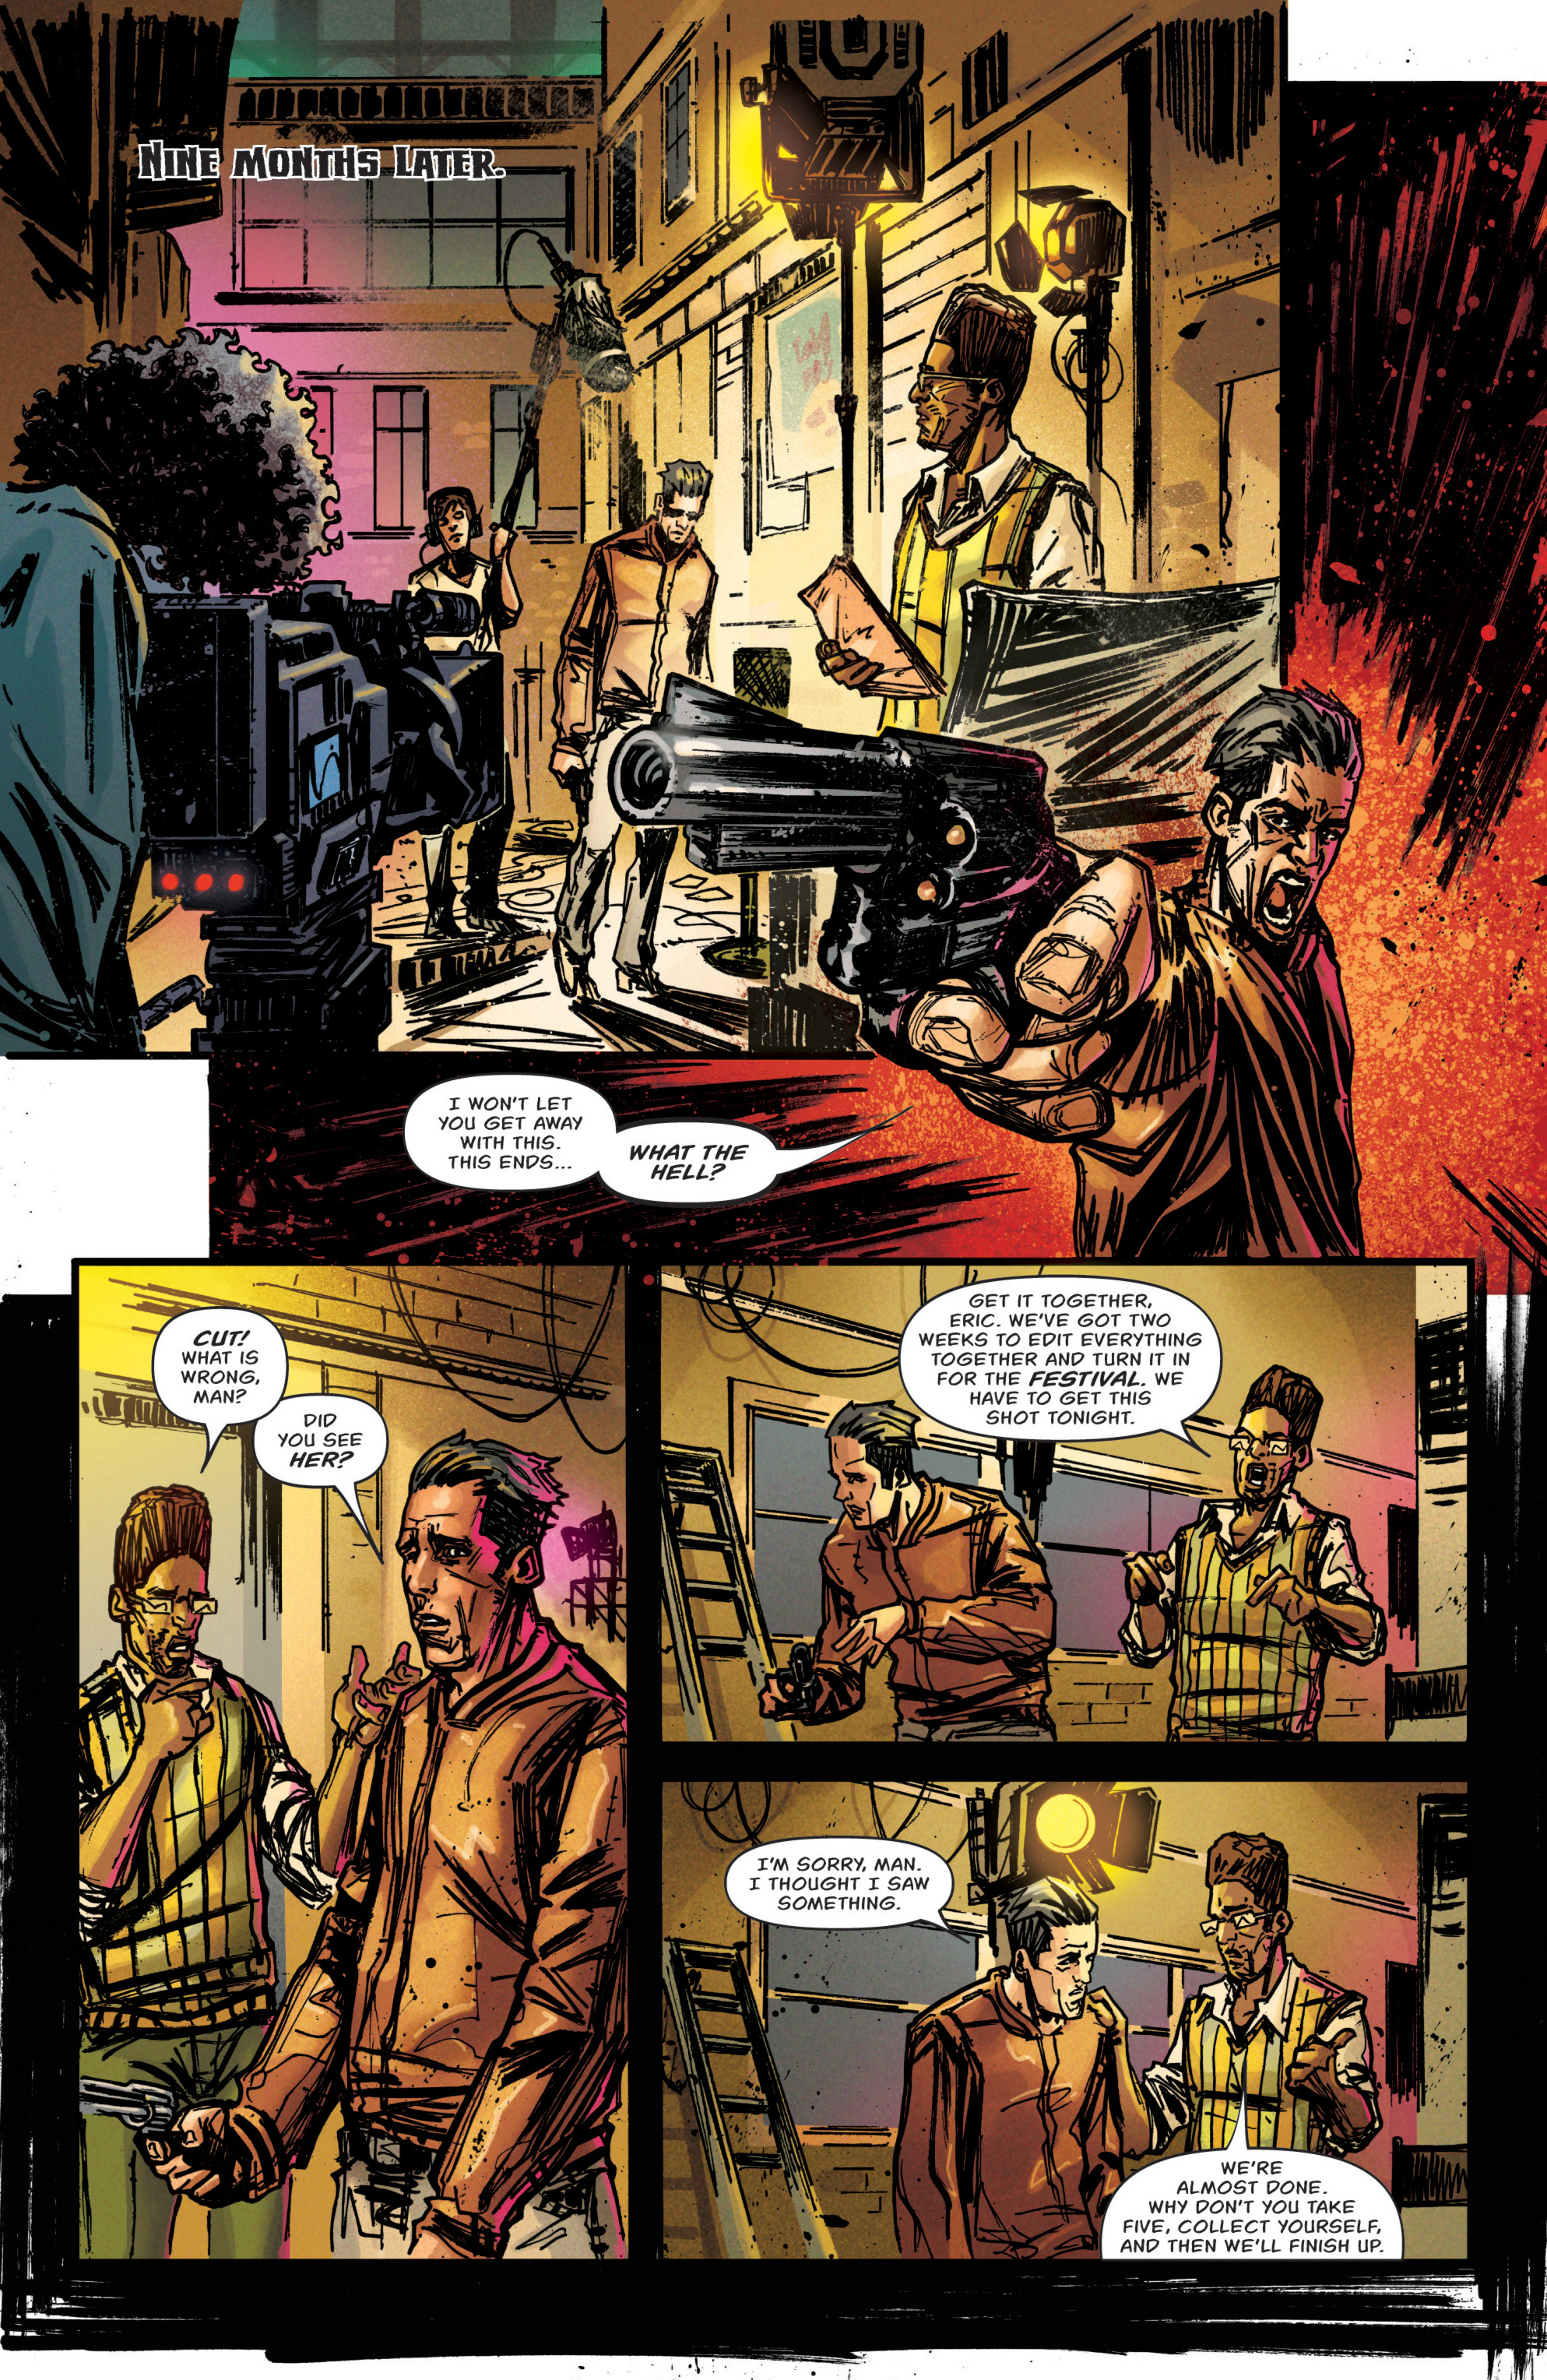 Read online Grimm Tales of Terror: Vol. 3 comic -  Issue #5 - 11